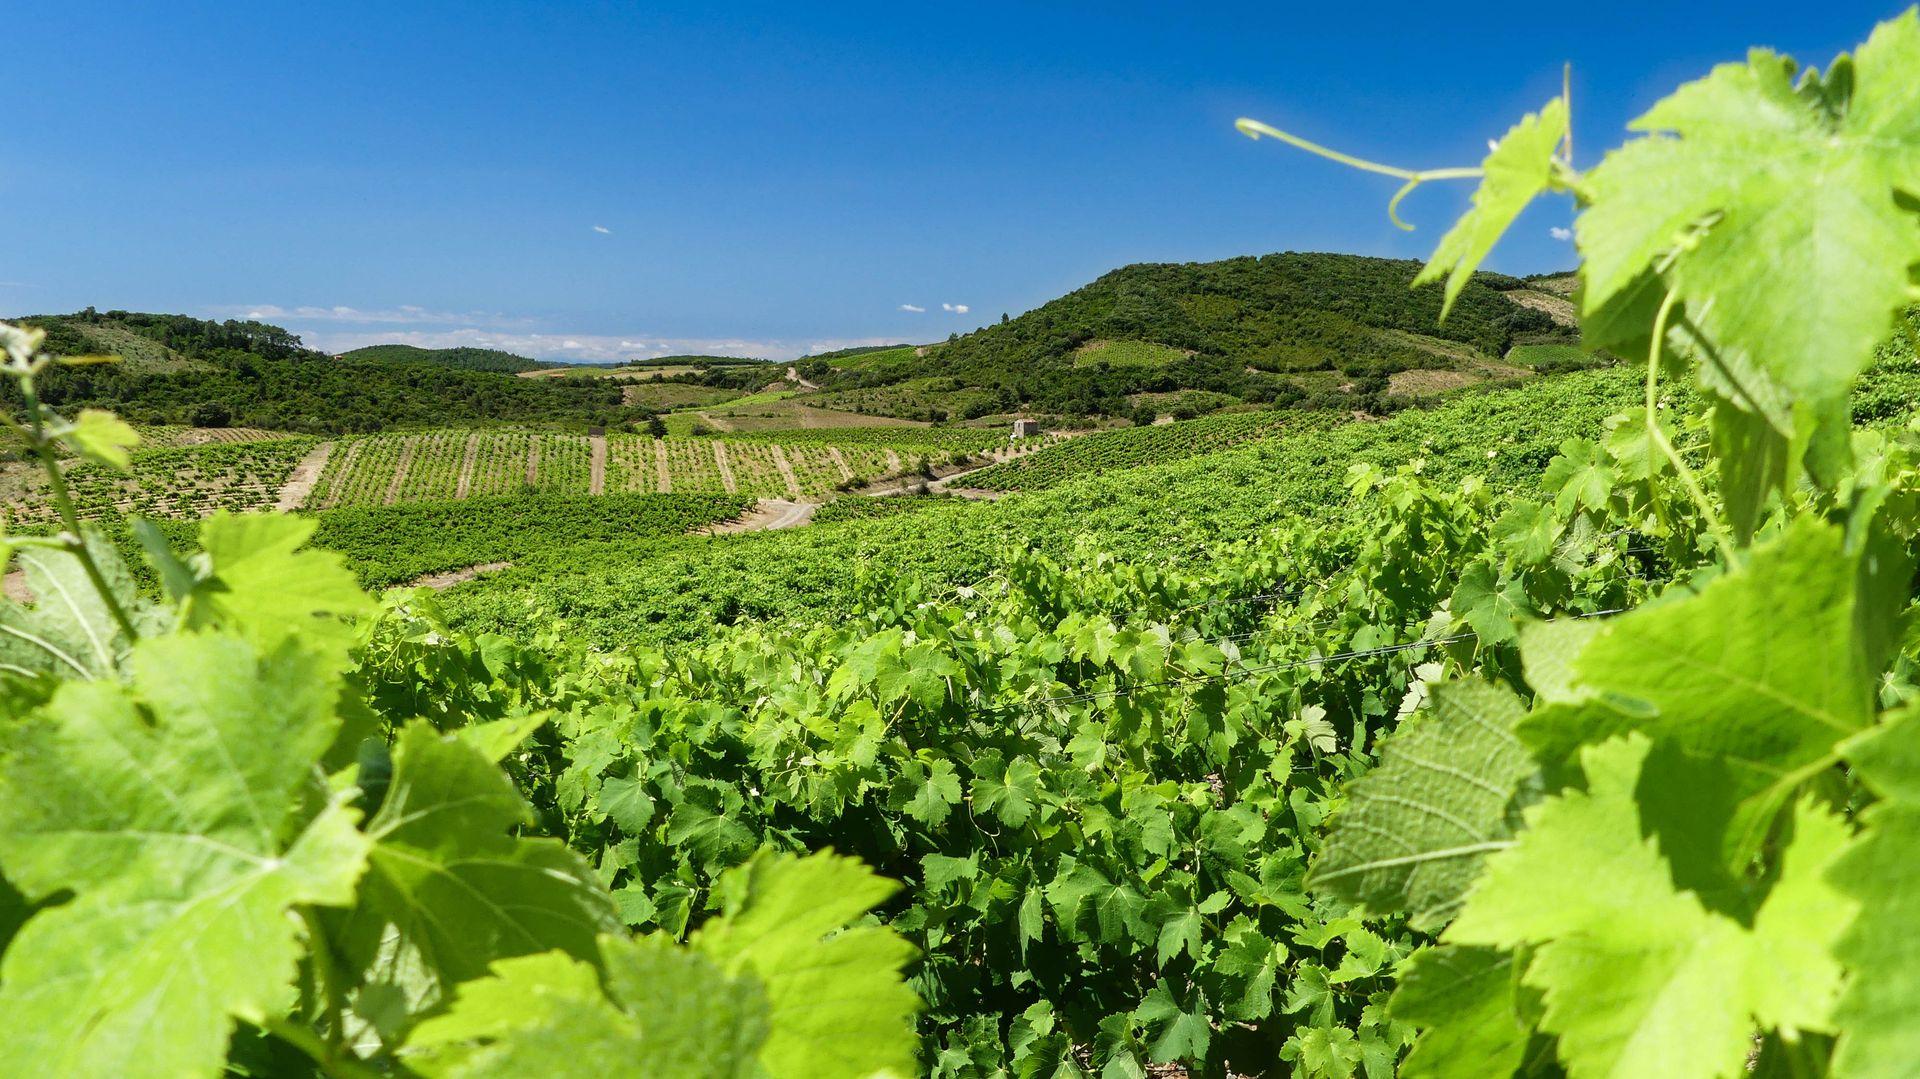 Vignobles de Roquebrun